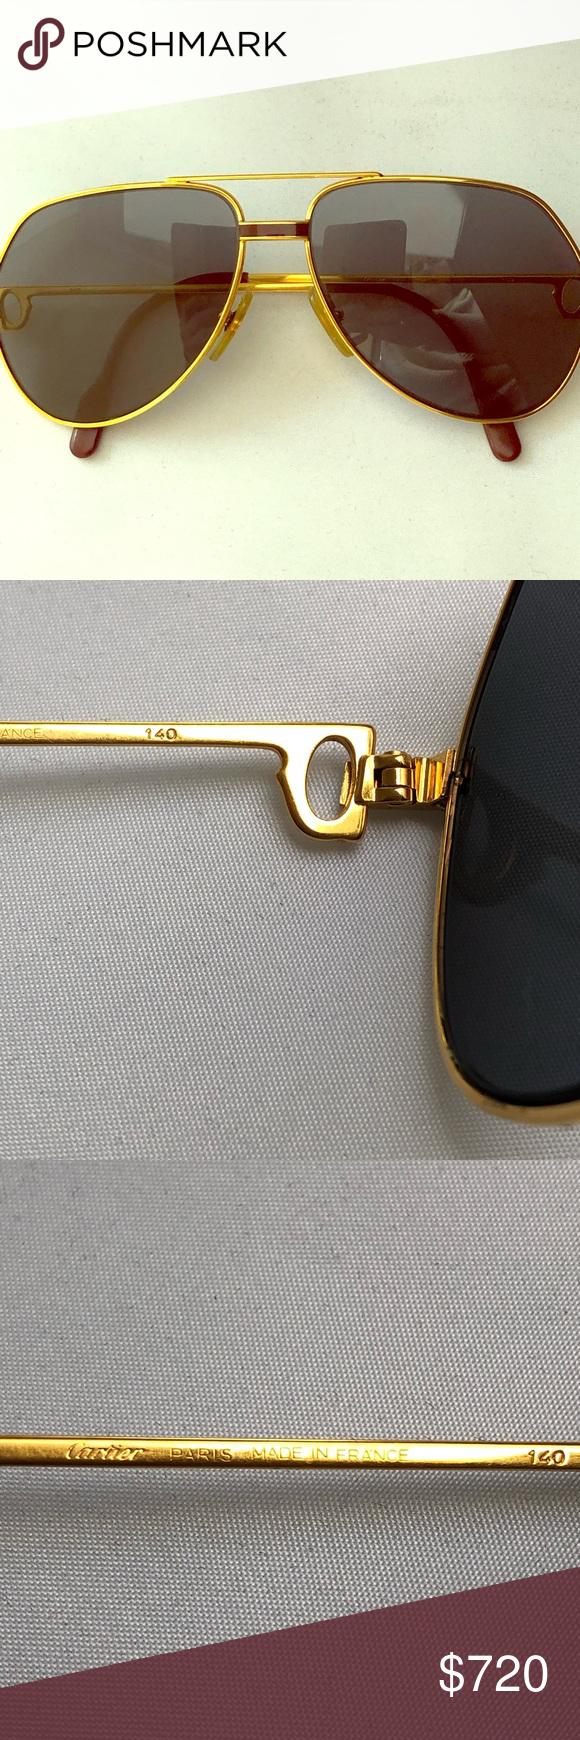 ab35784f24 Cartier Laque de Chine Aviator Sunglasses France Cartier Laque de Chine  Aviator Gold 56Mm Heavy Plated Sunglasses France VINTAGE RARE Cartier  Accessories ...